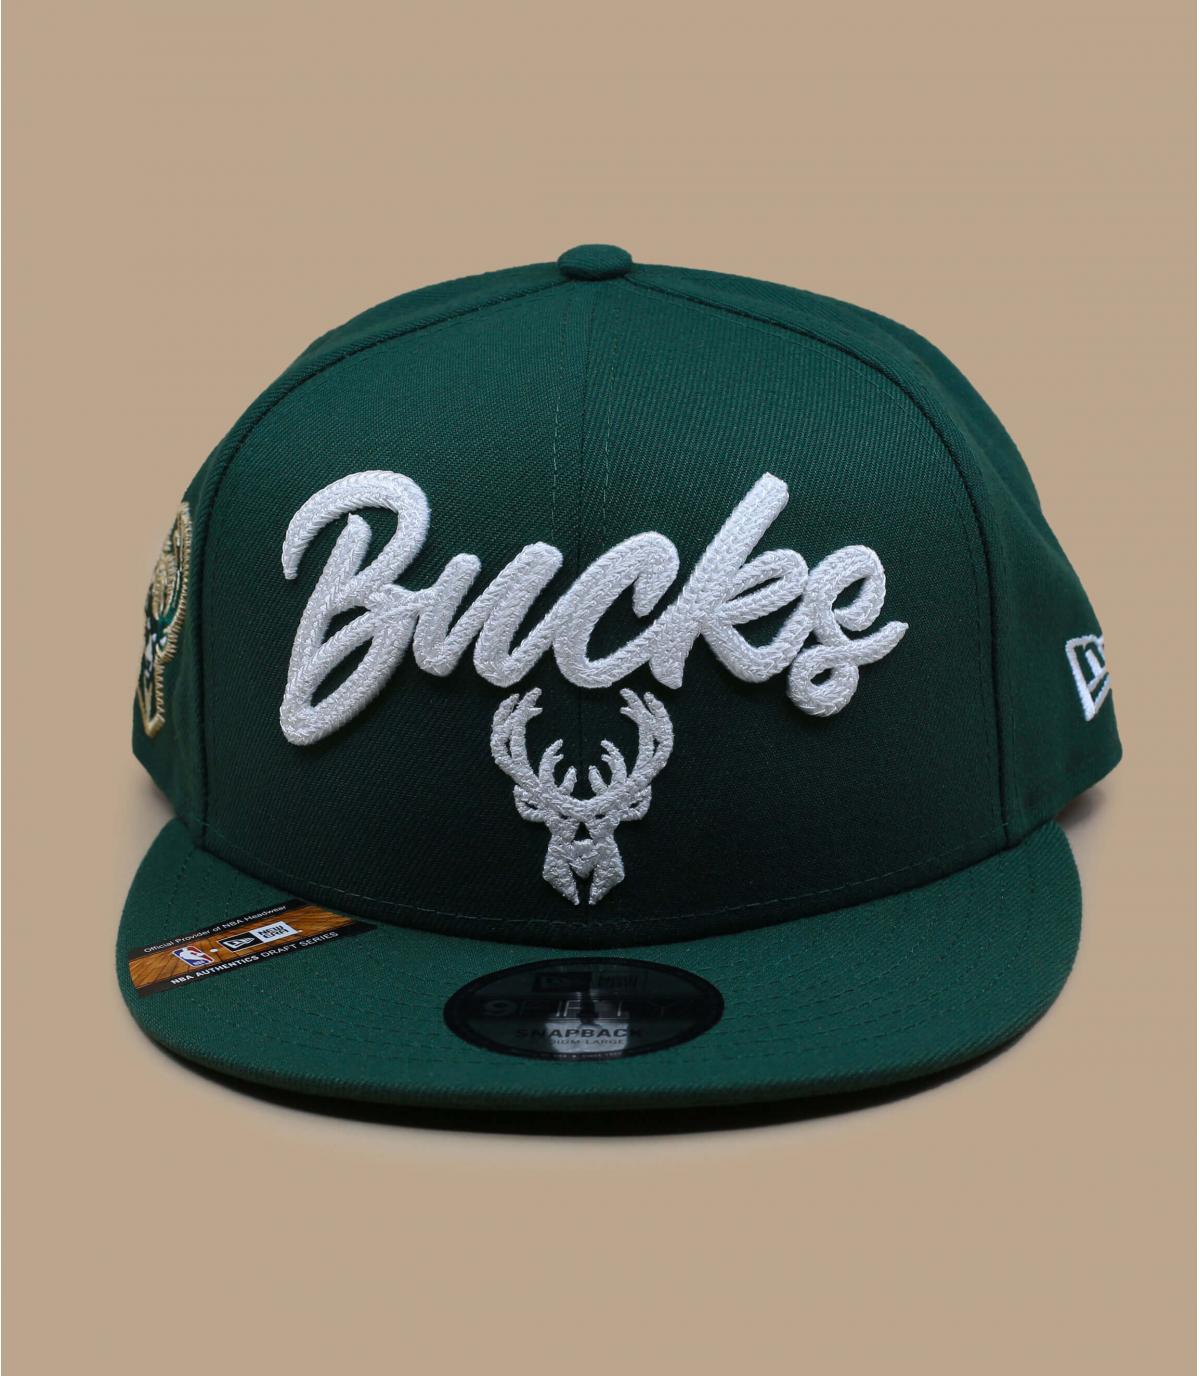 Détails Snapback NBA Draft Bucks 950 - image 2